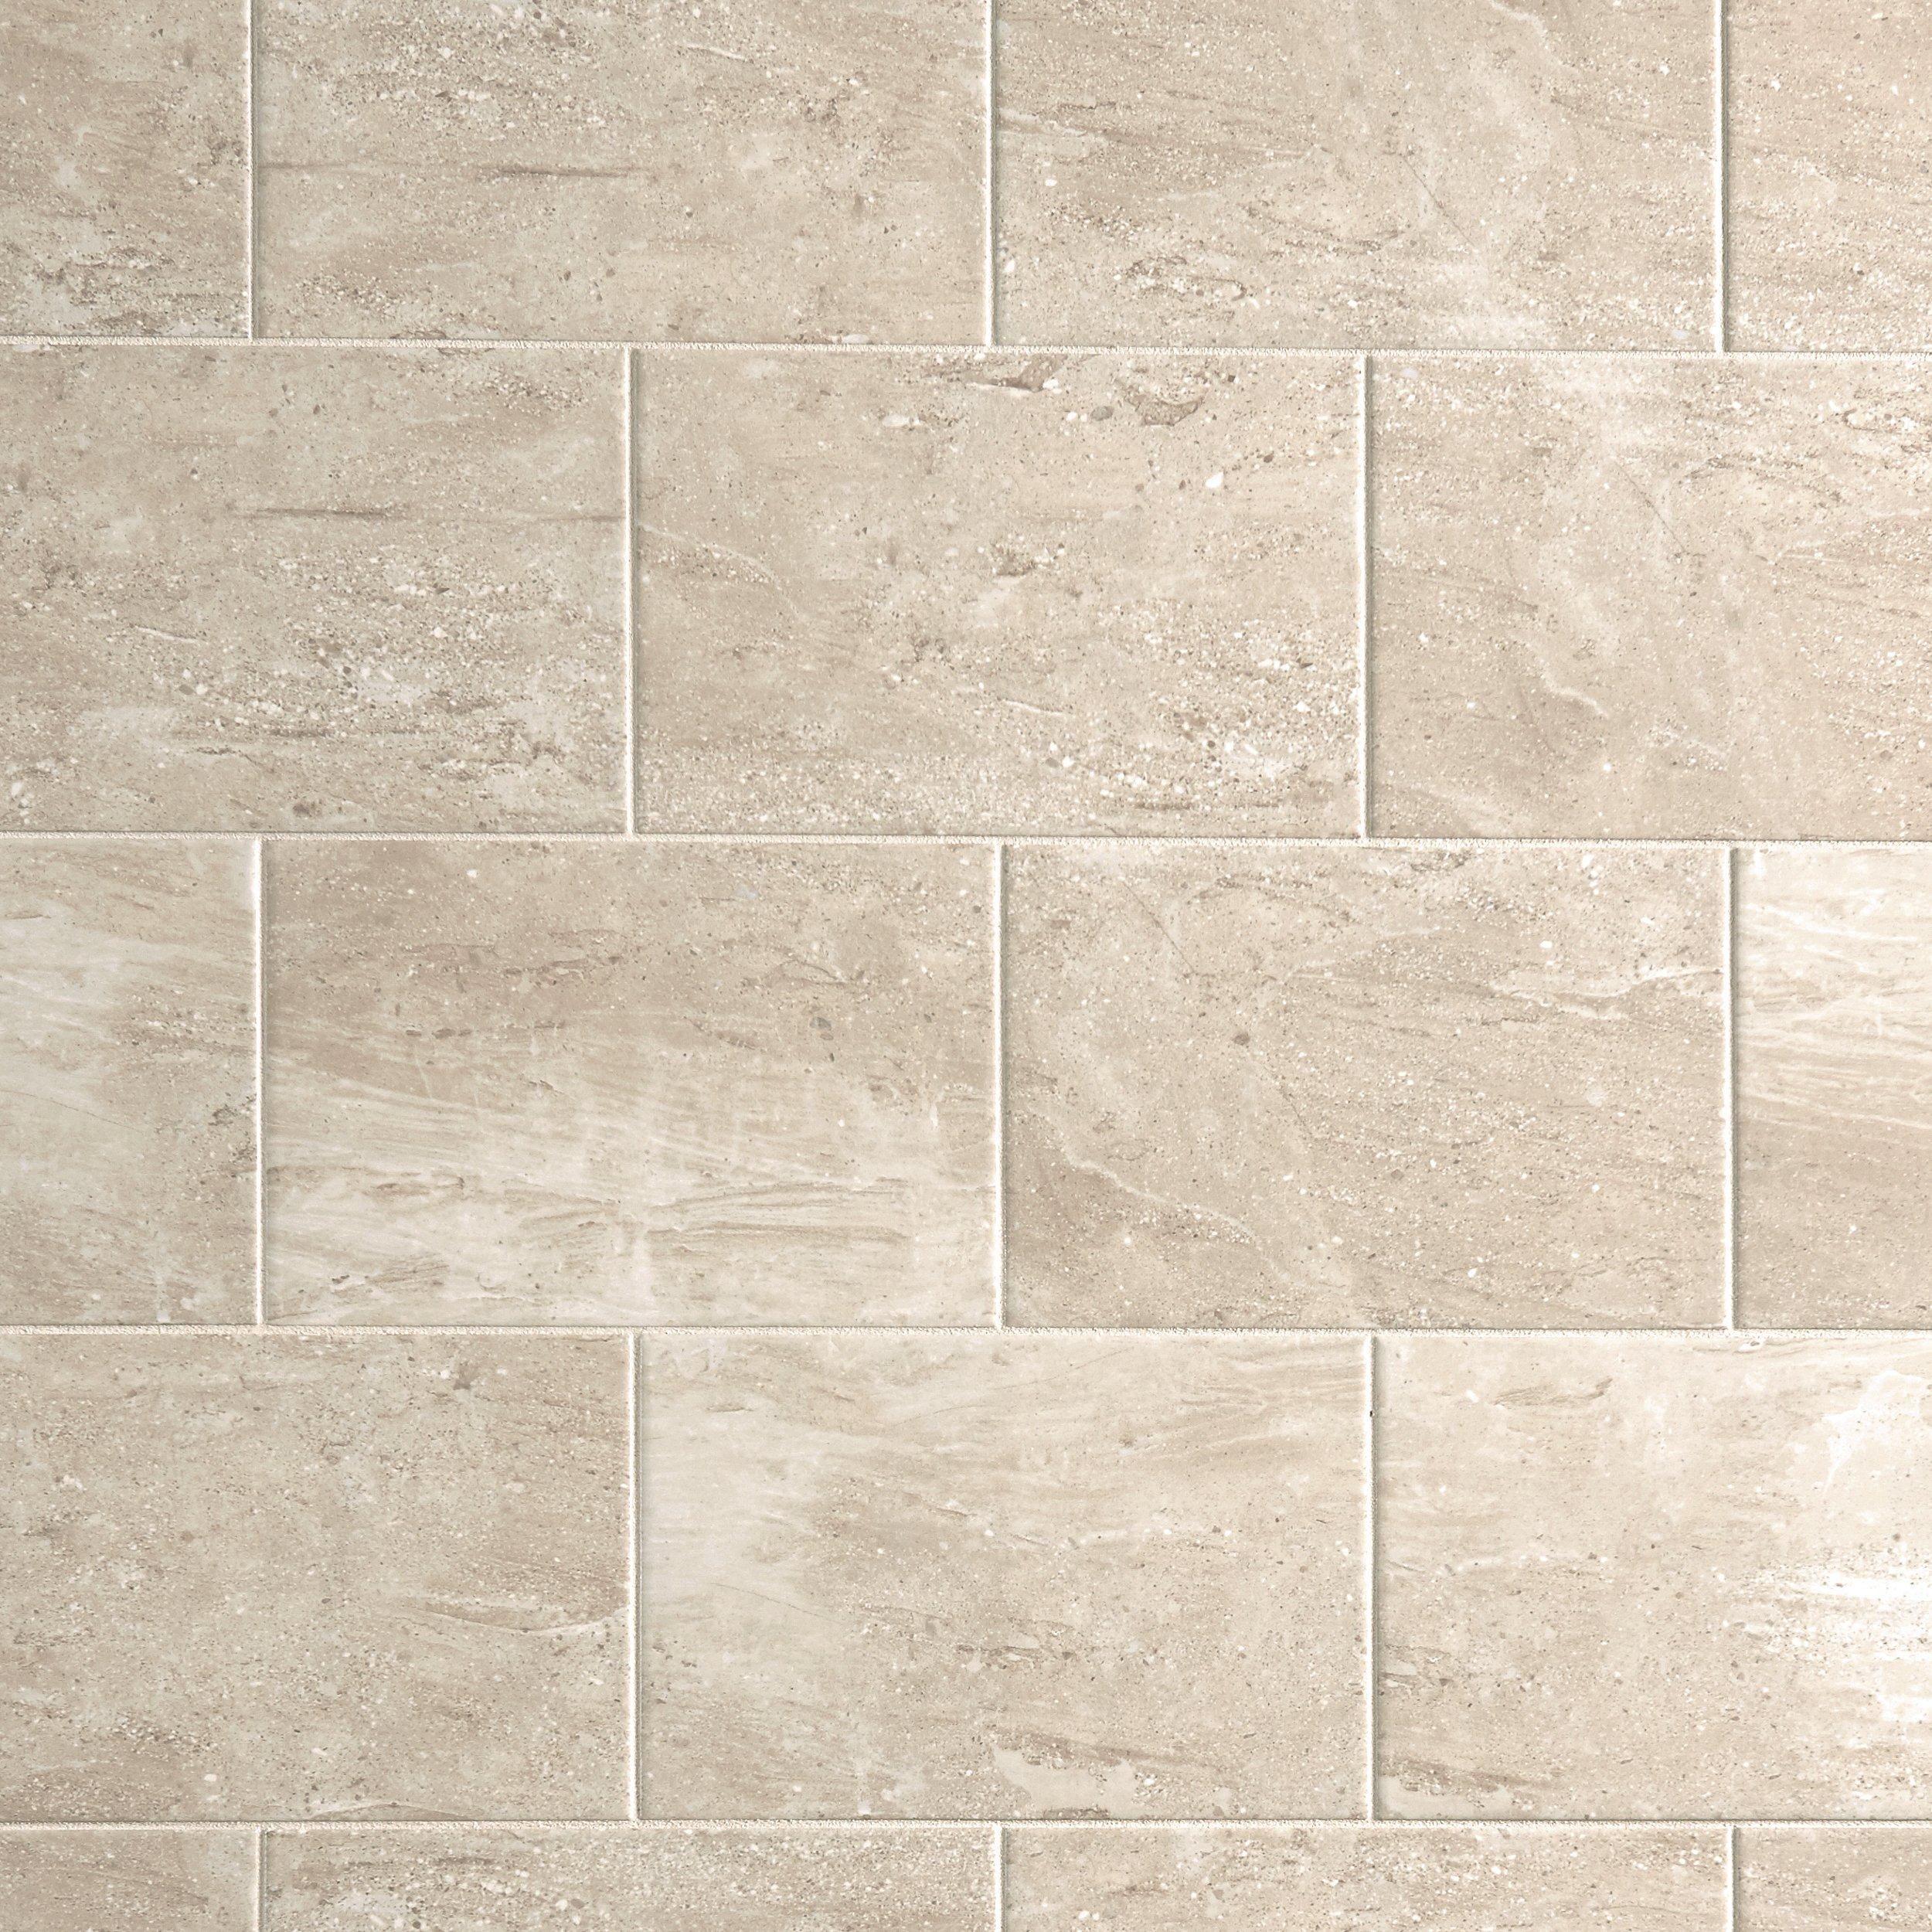 roman white marble ceramic tile products in 2019 tiles white bathroom tiles ceramic floor. Black Bedroom Furniture Sets. Home Design Ideas